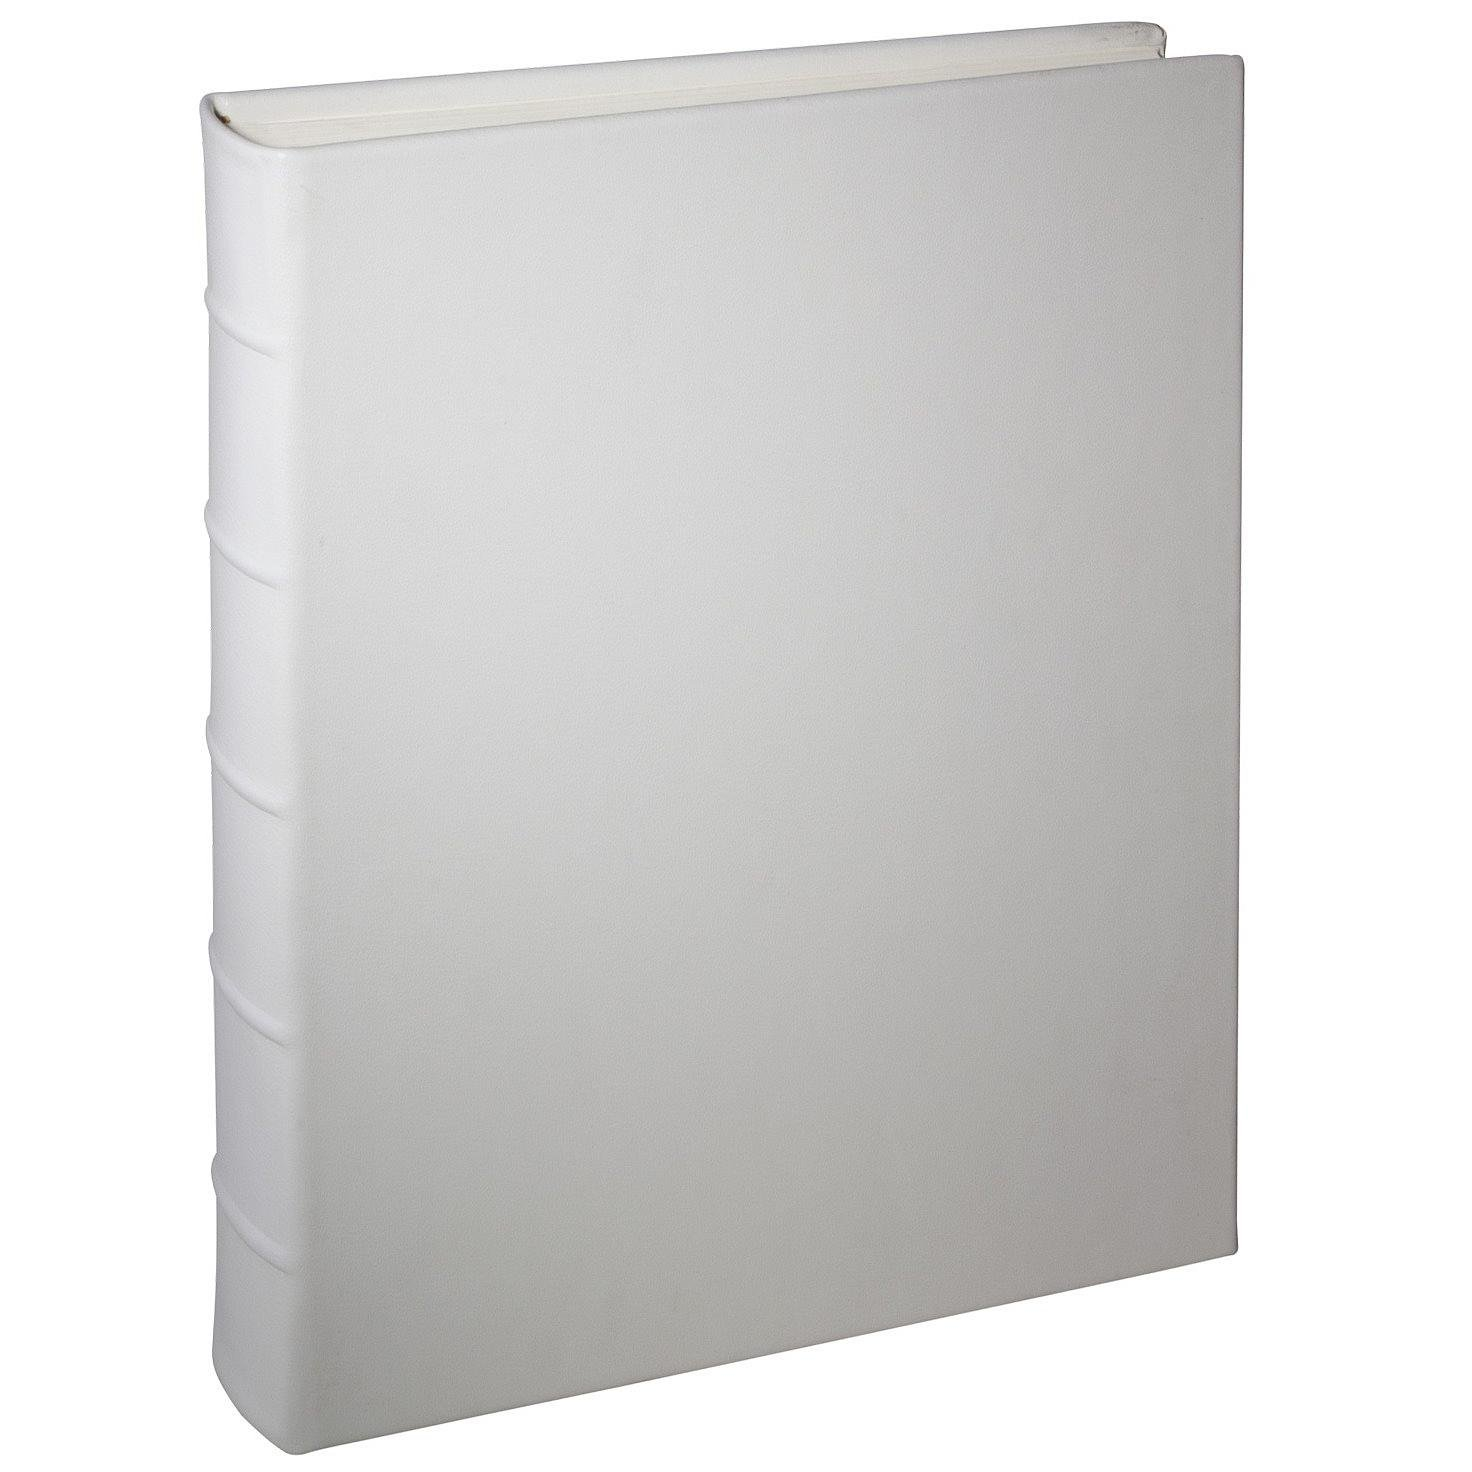 Wedding White Leather Medium Bound Album by Graphic Image - 9x12